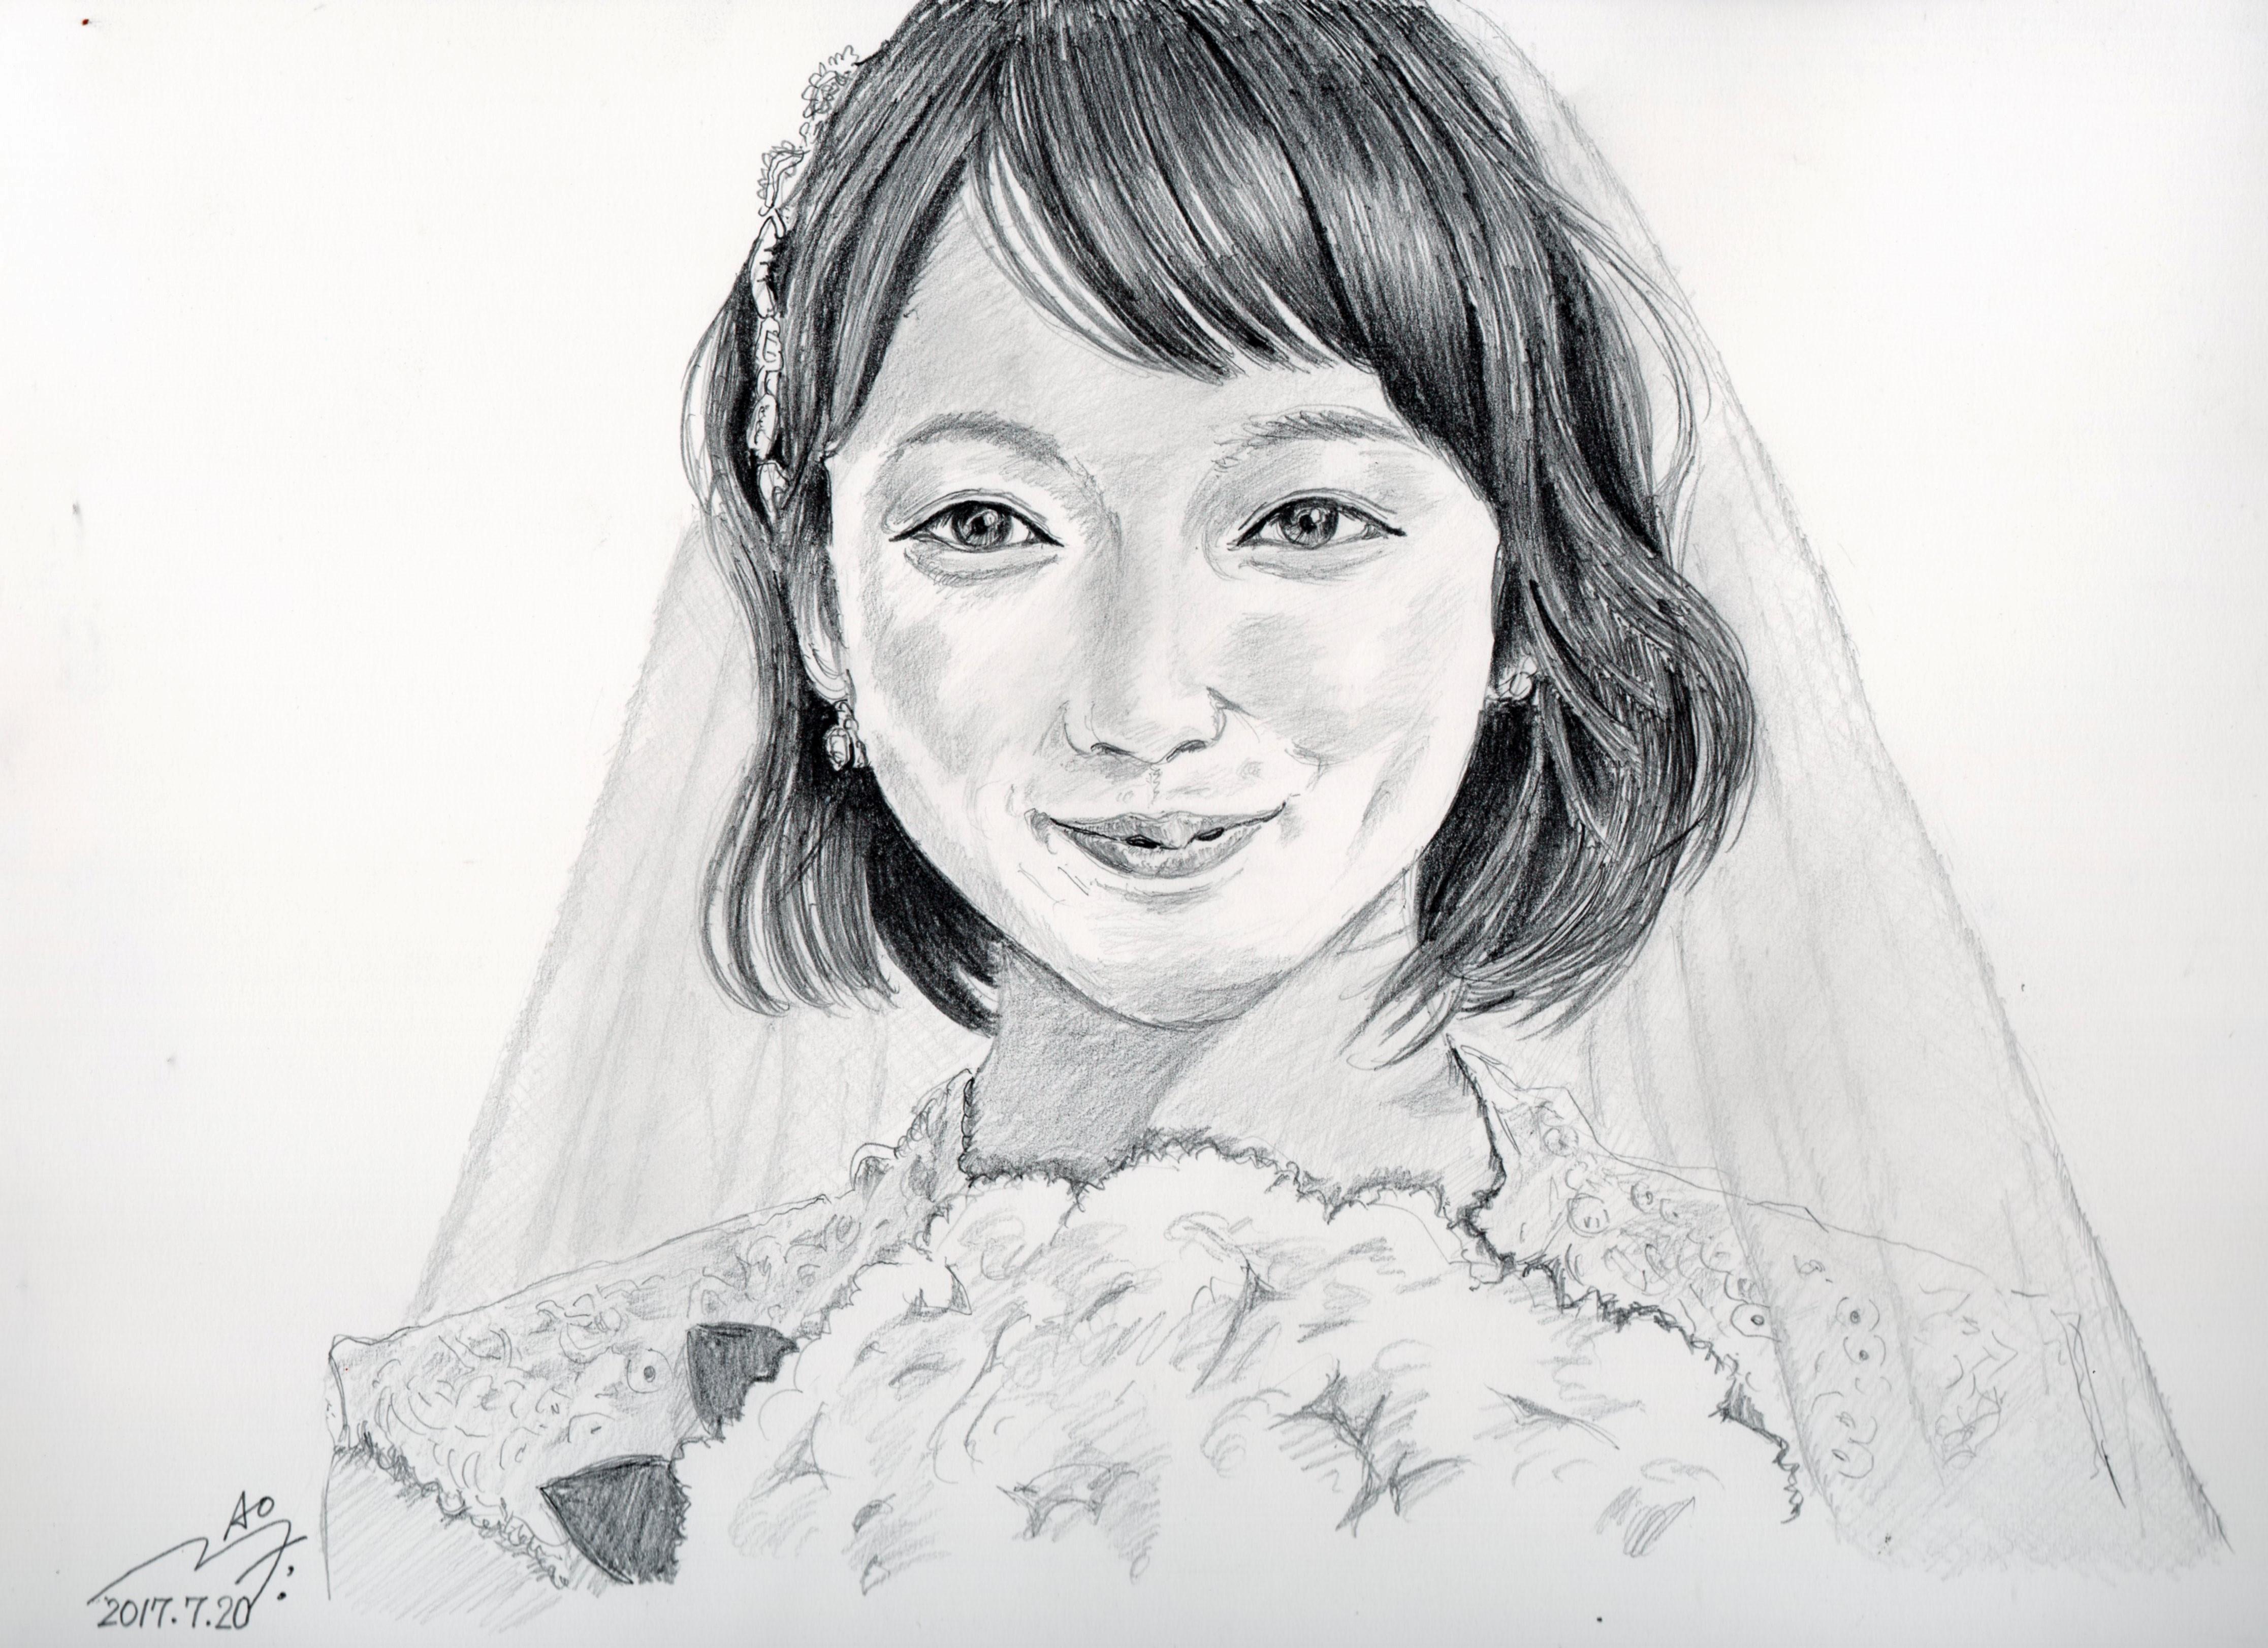 吉岡里帆の鉛筆画似顔絵